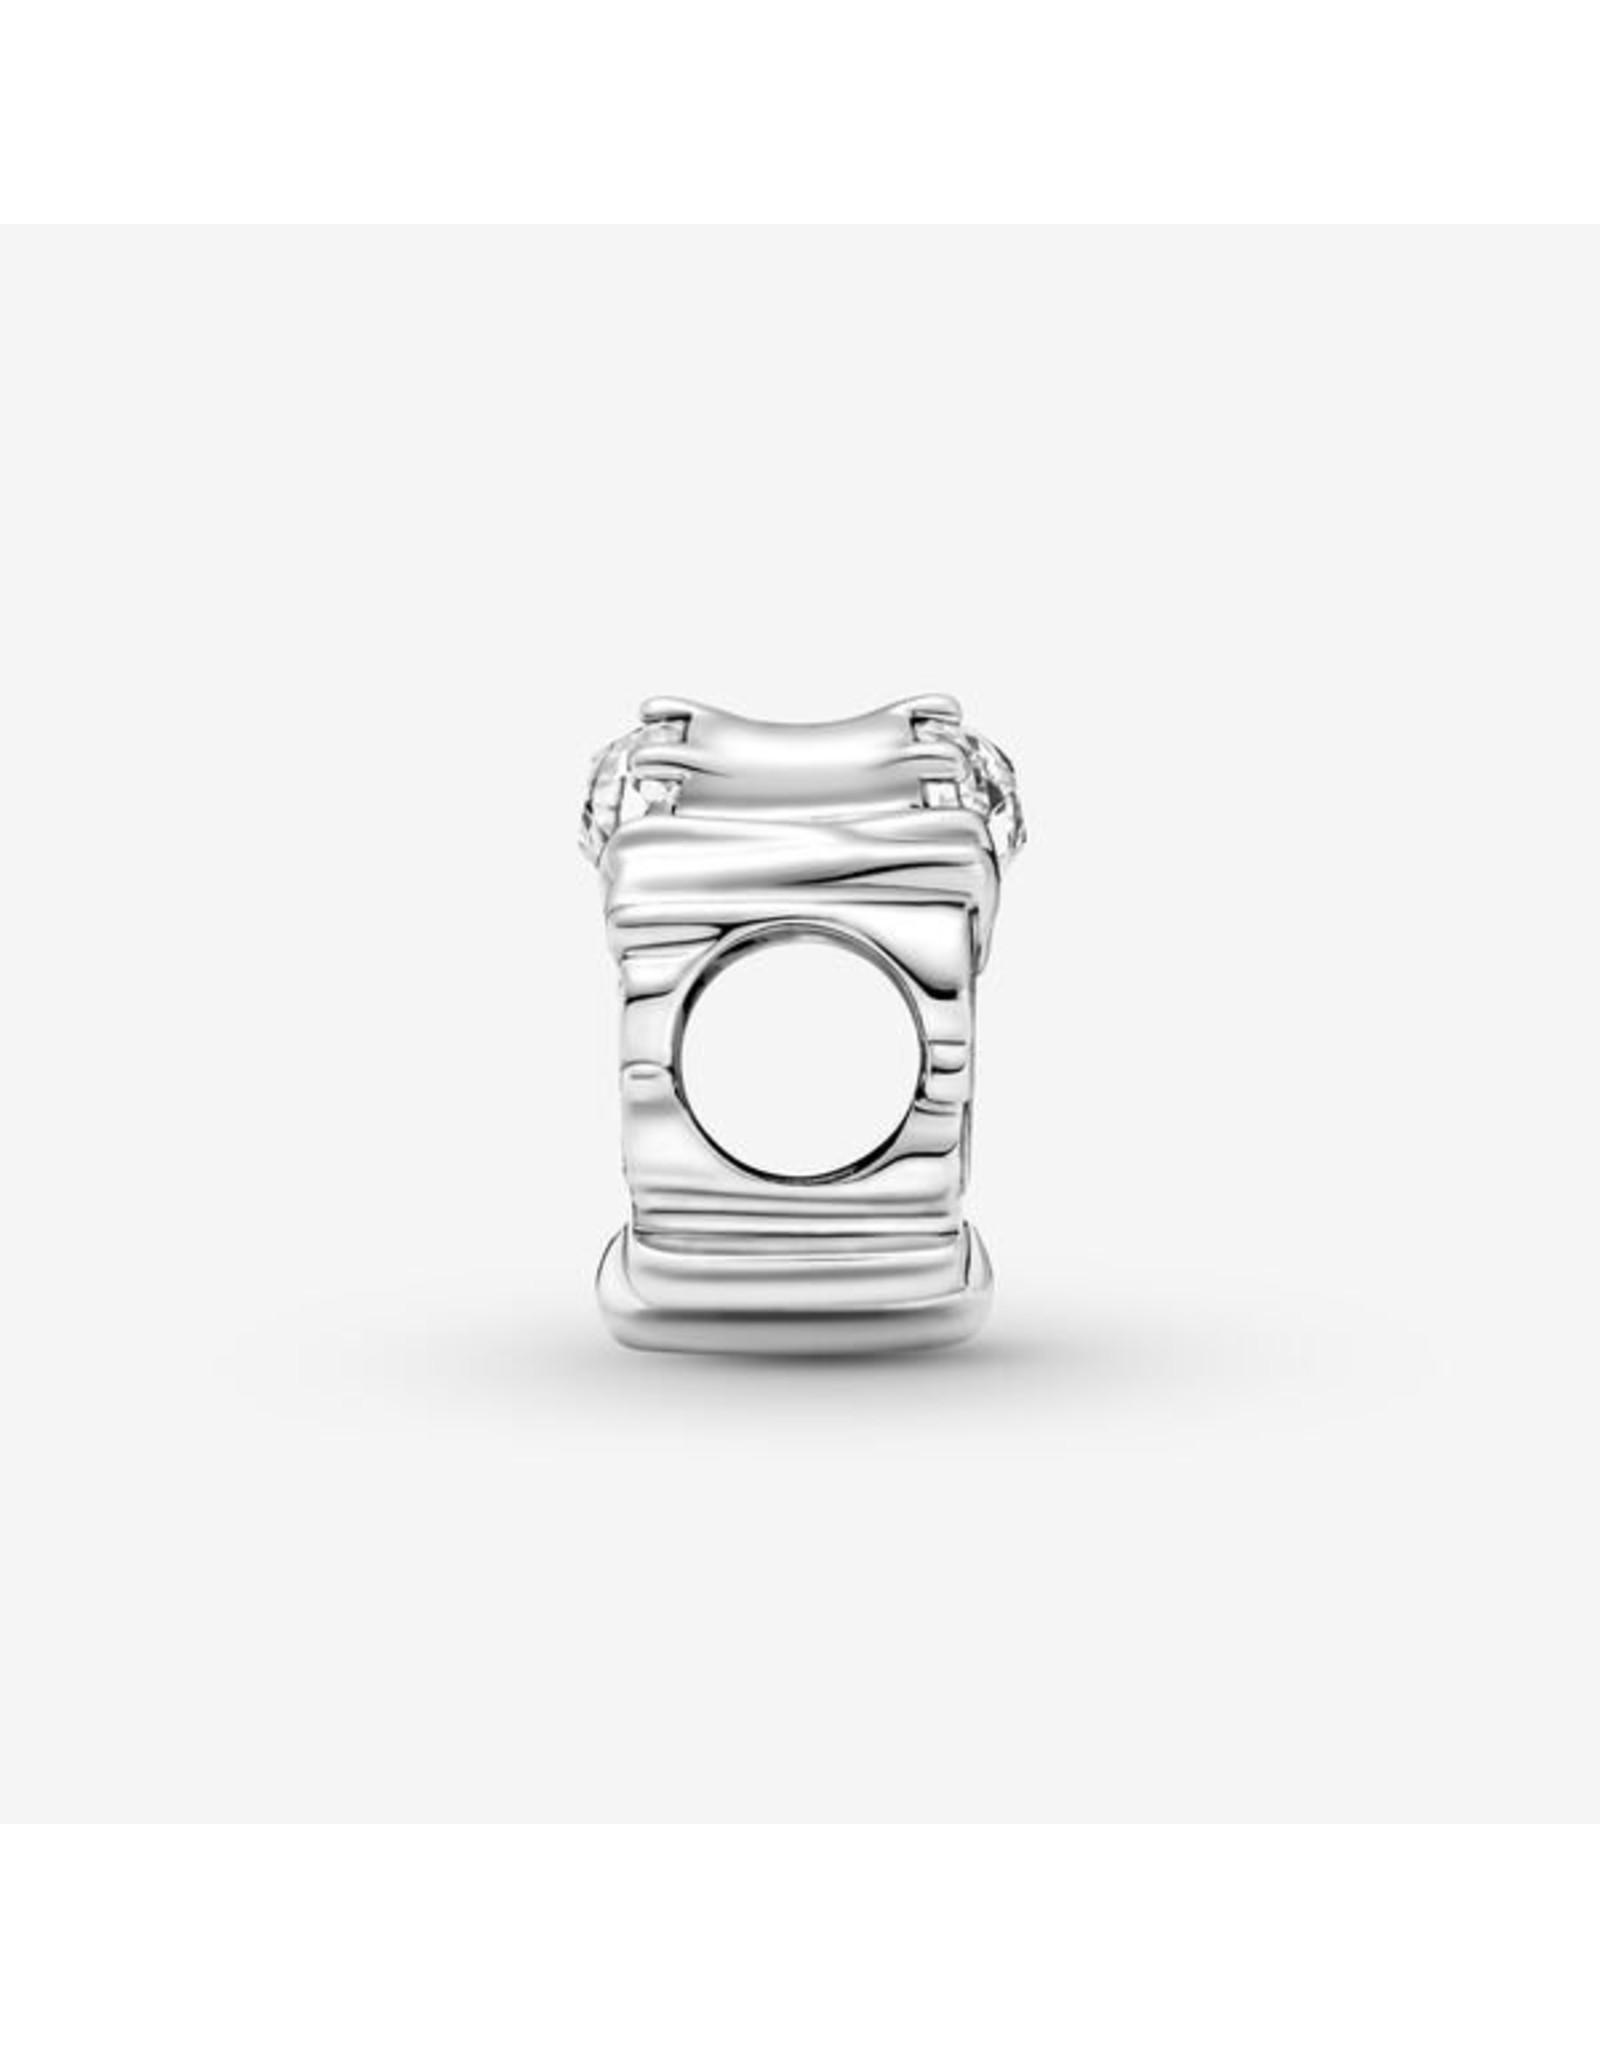 Pandora Pandora Charm,799524C01, Openwork Dancing Queen Charm, Clear CZ